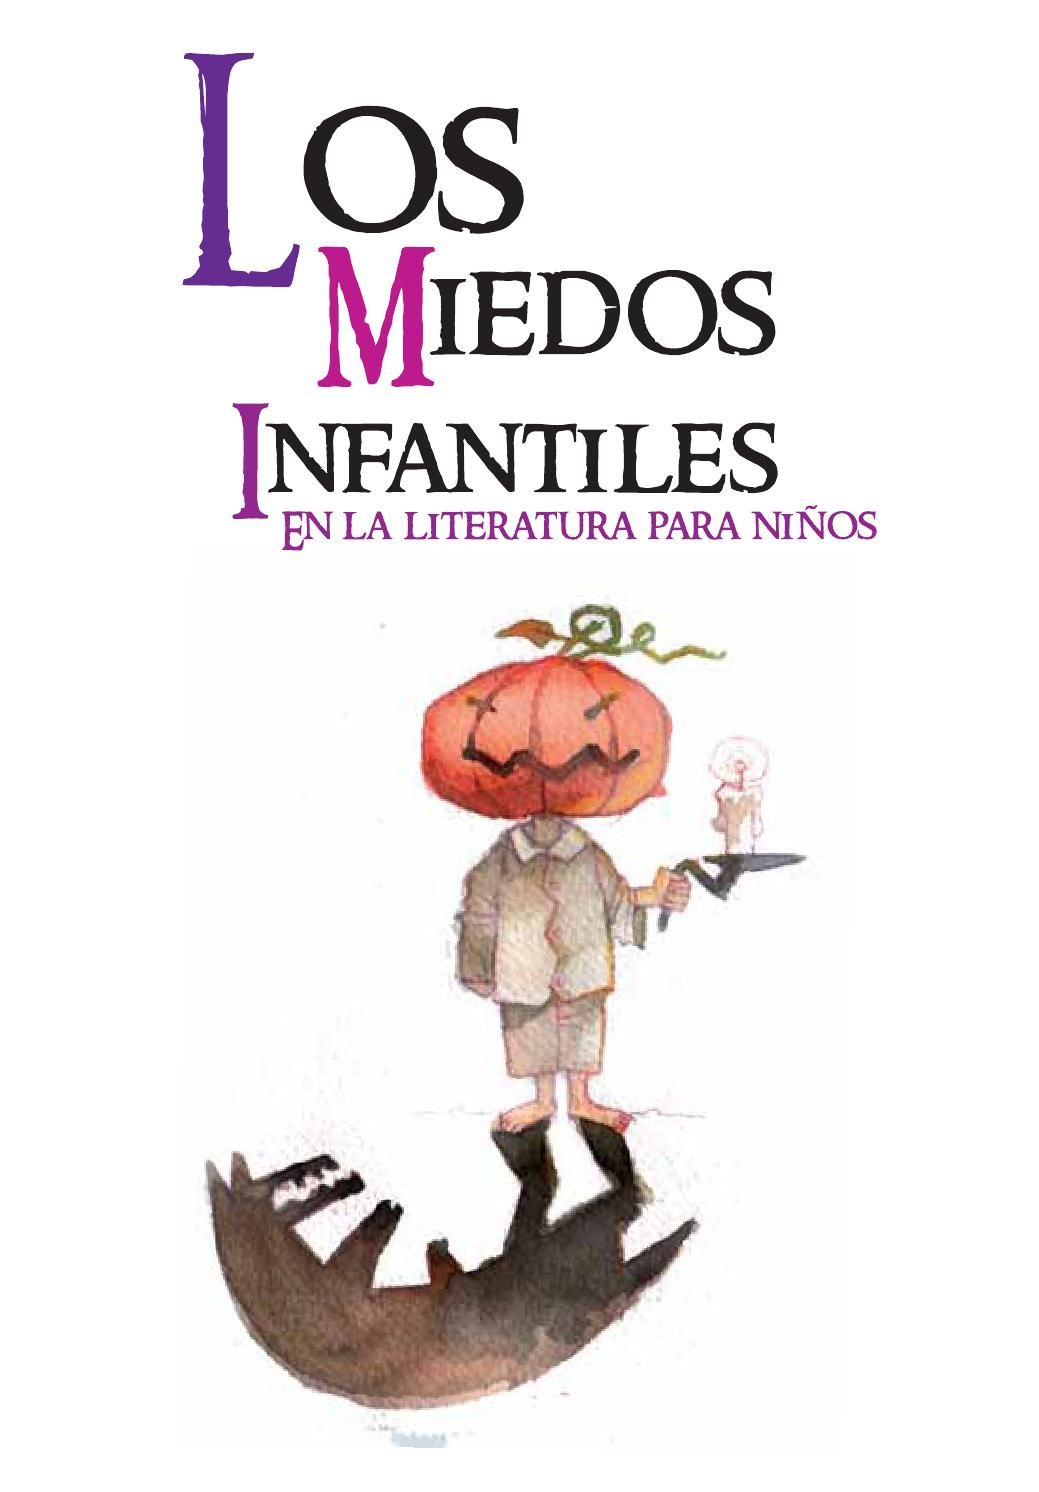 Miedos Infantiles Literatura Para Niños Psicologia Infantil La Literatura Infantil